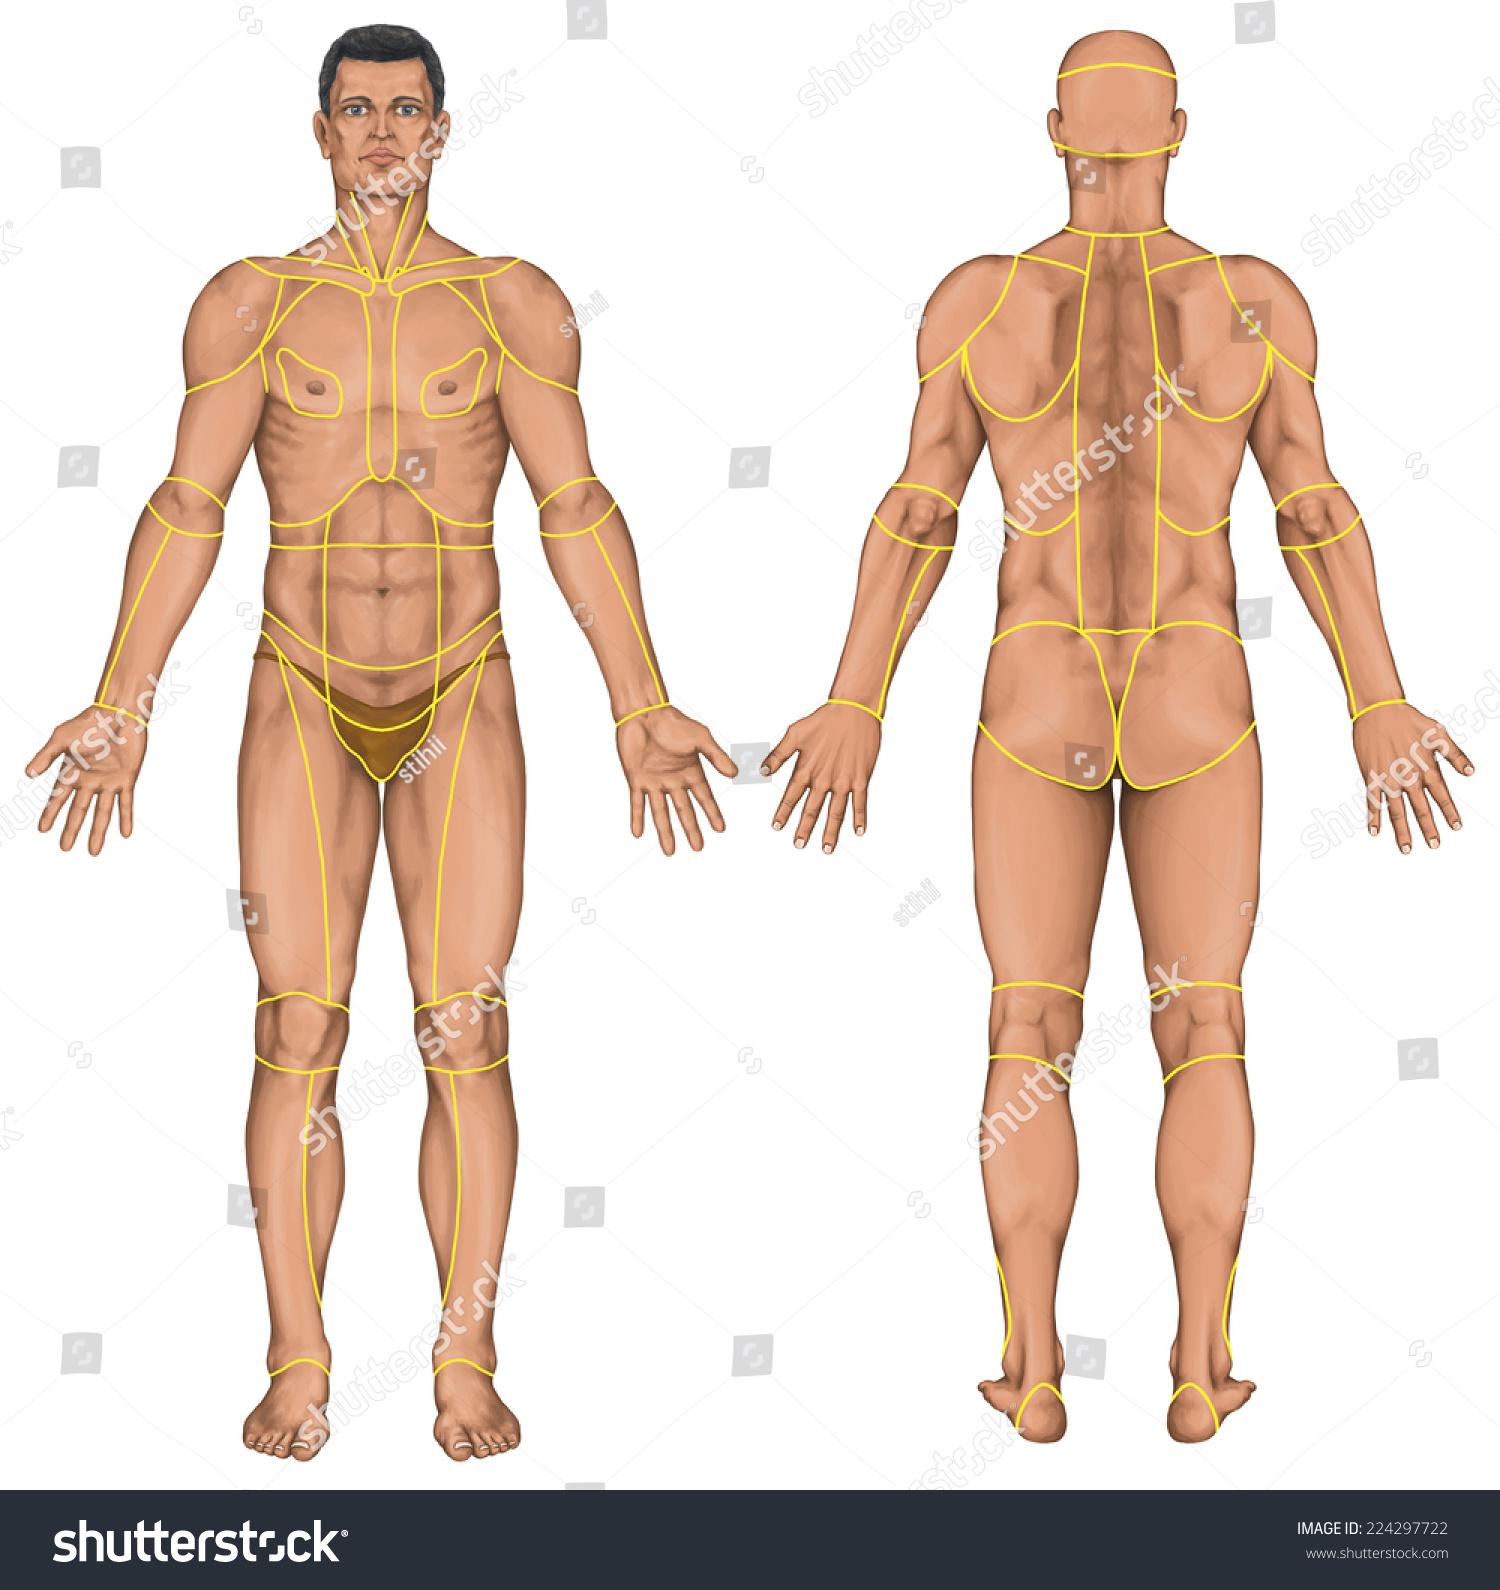 Royalty Free Stock Illustration of Region Human Body Regions ...